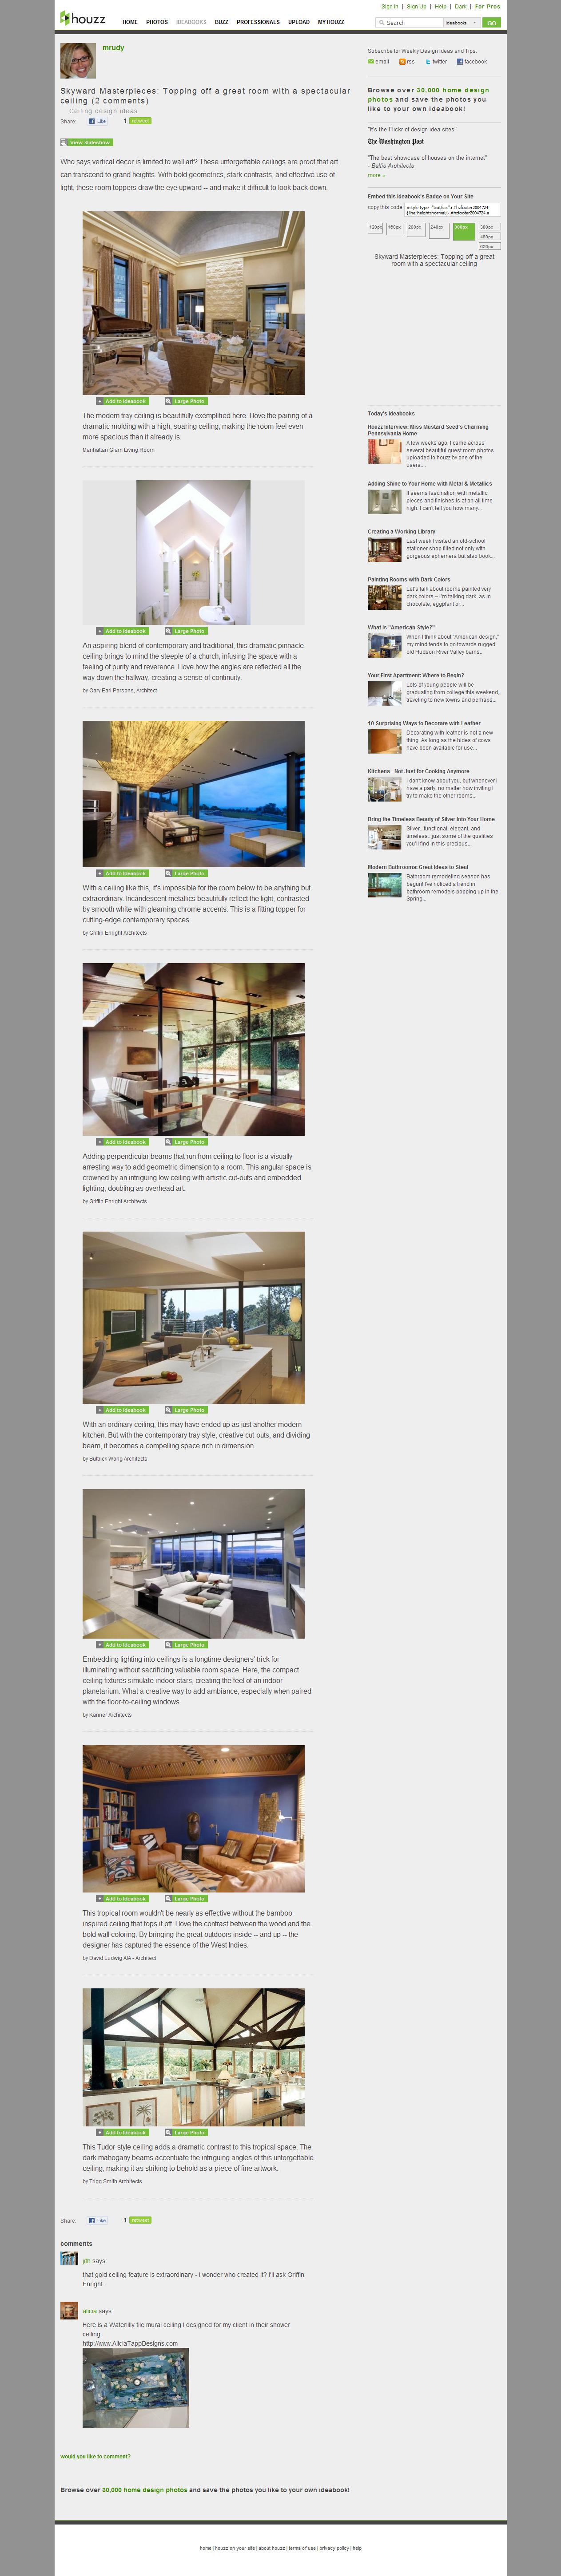 Home Decor Article: Ceiling Design Ideas